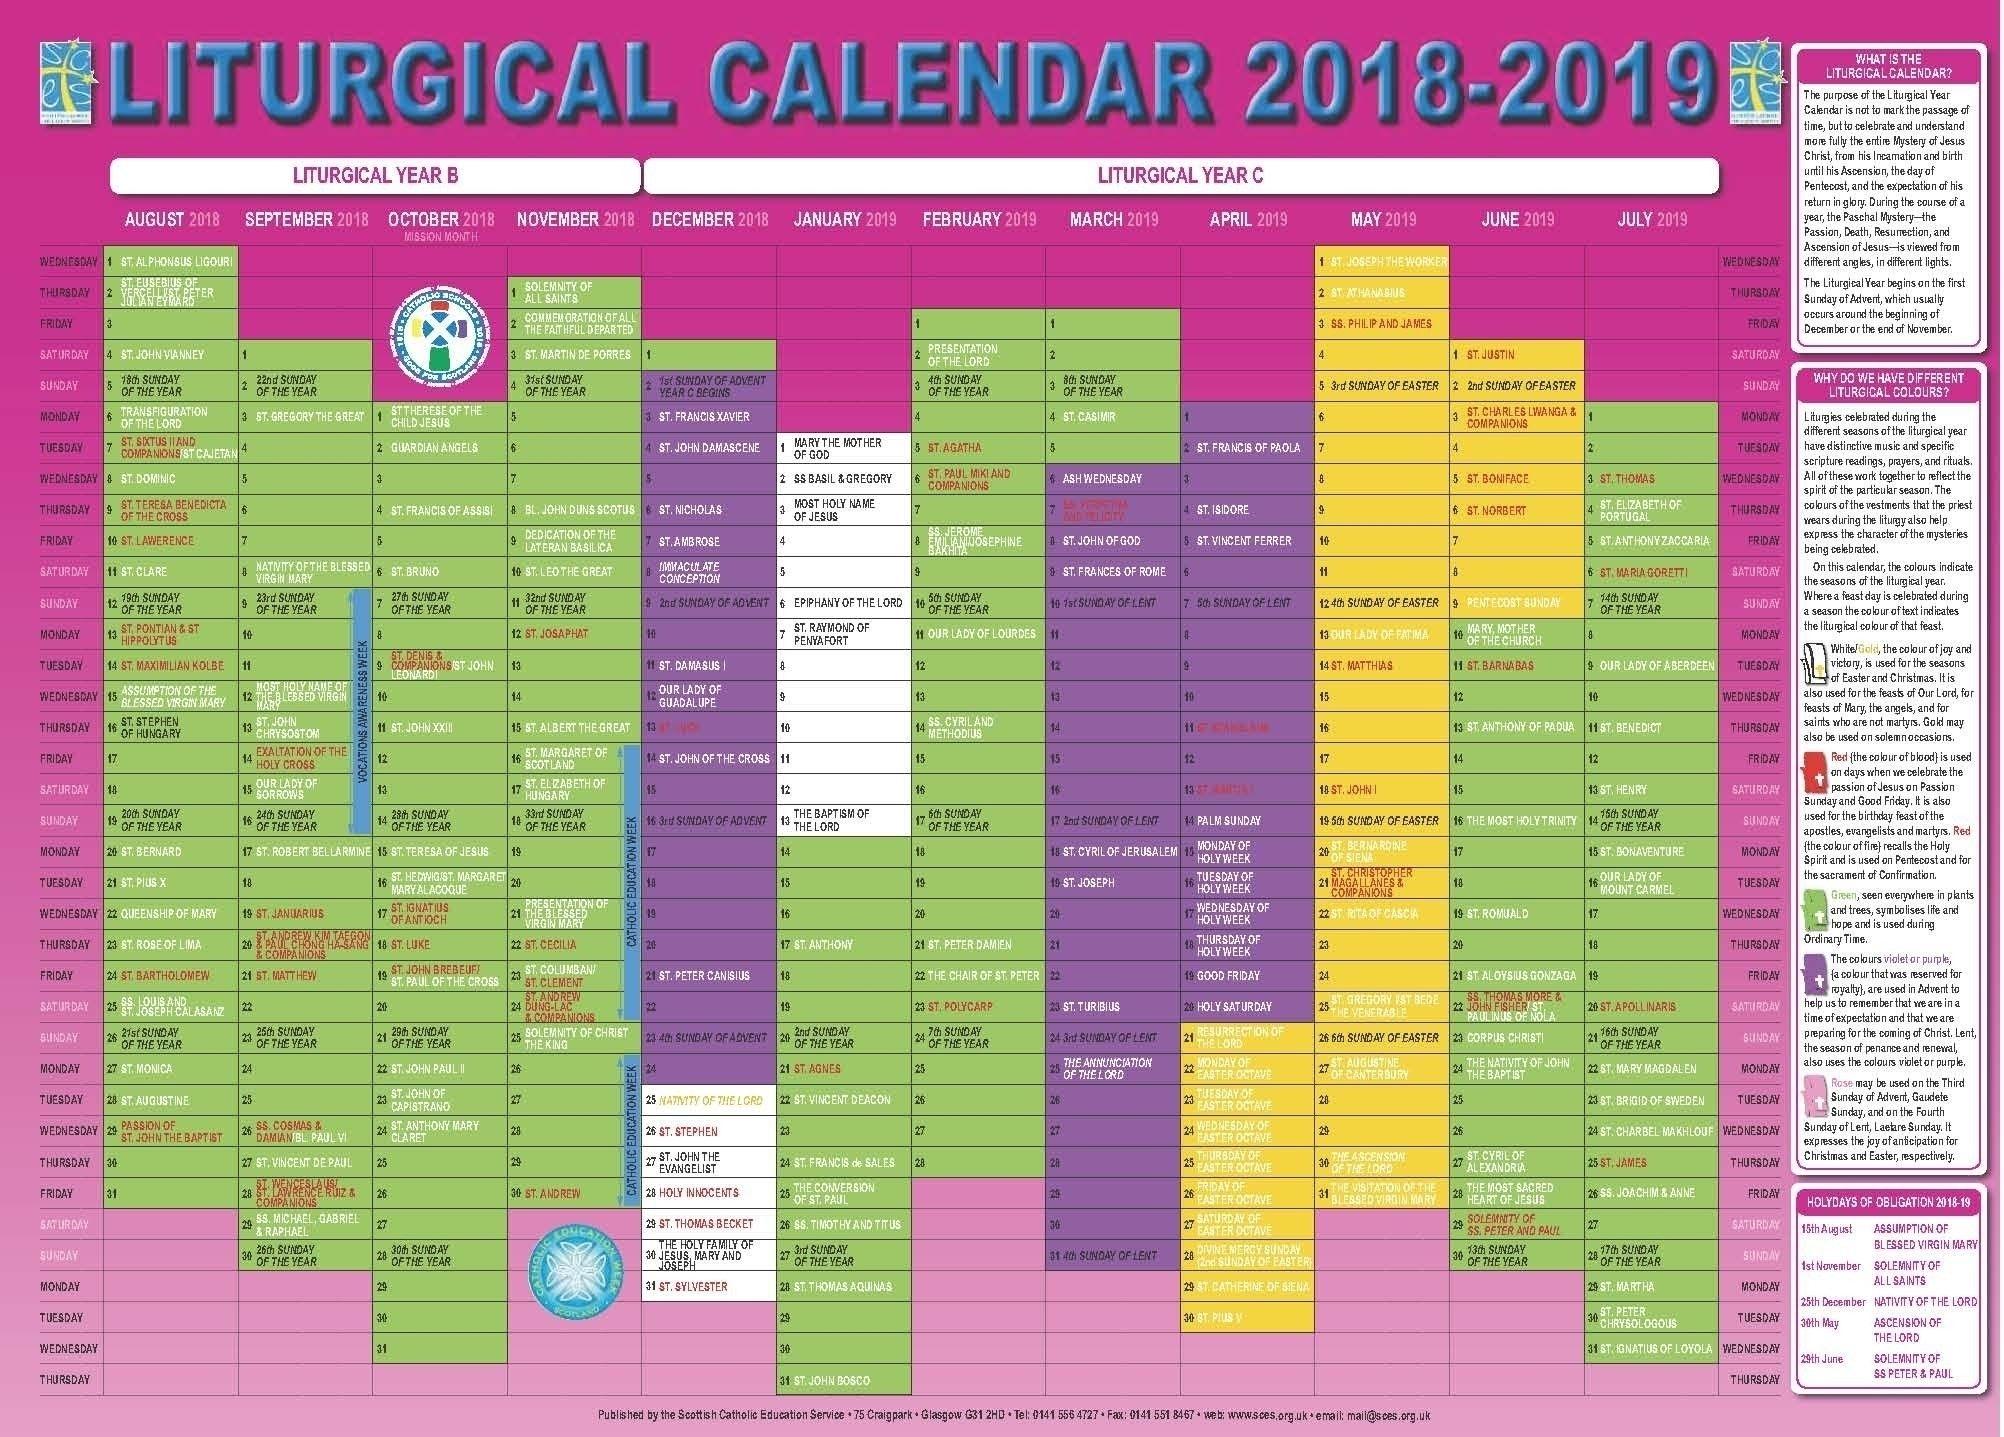 Free Printable Liturgical Calendar In 2020   Catholic throughout Liturgical Calendar For 2020 Printable